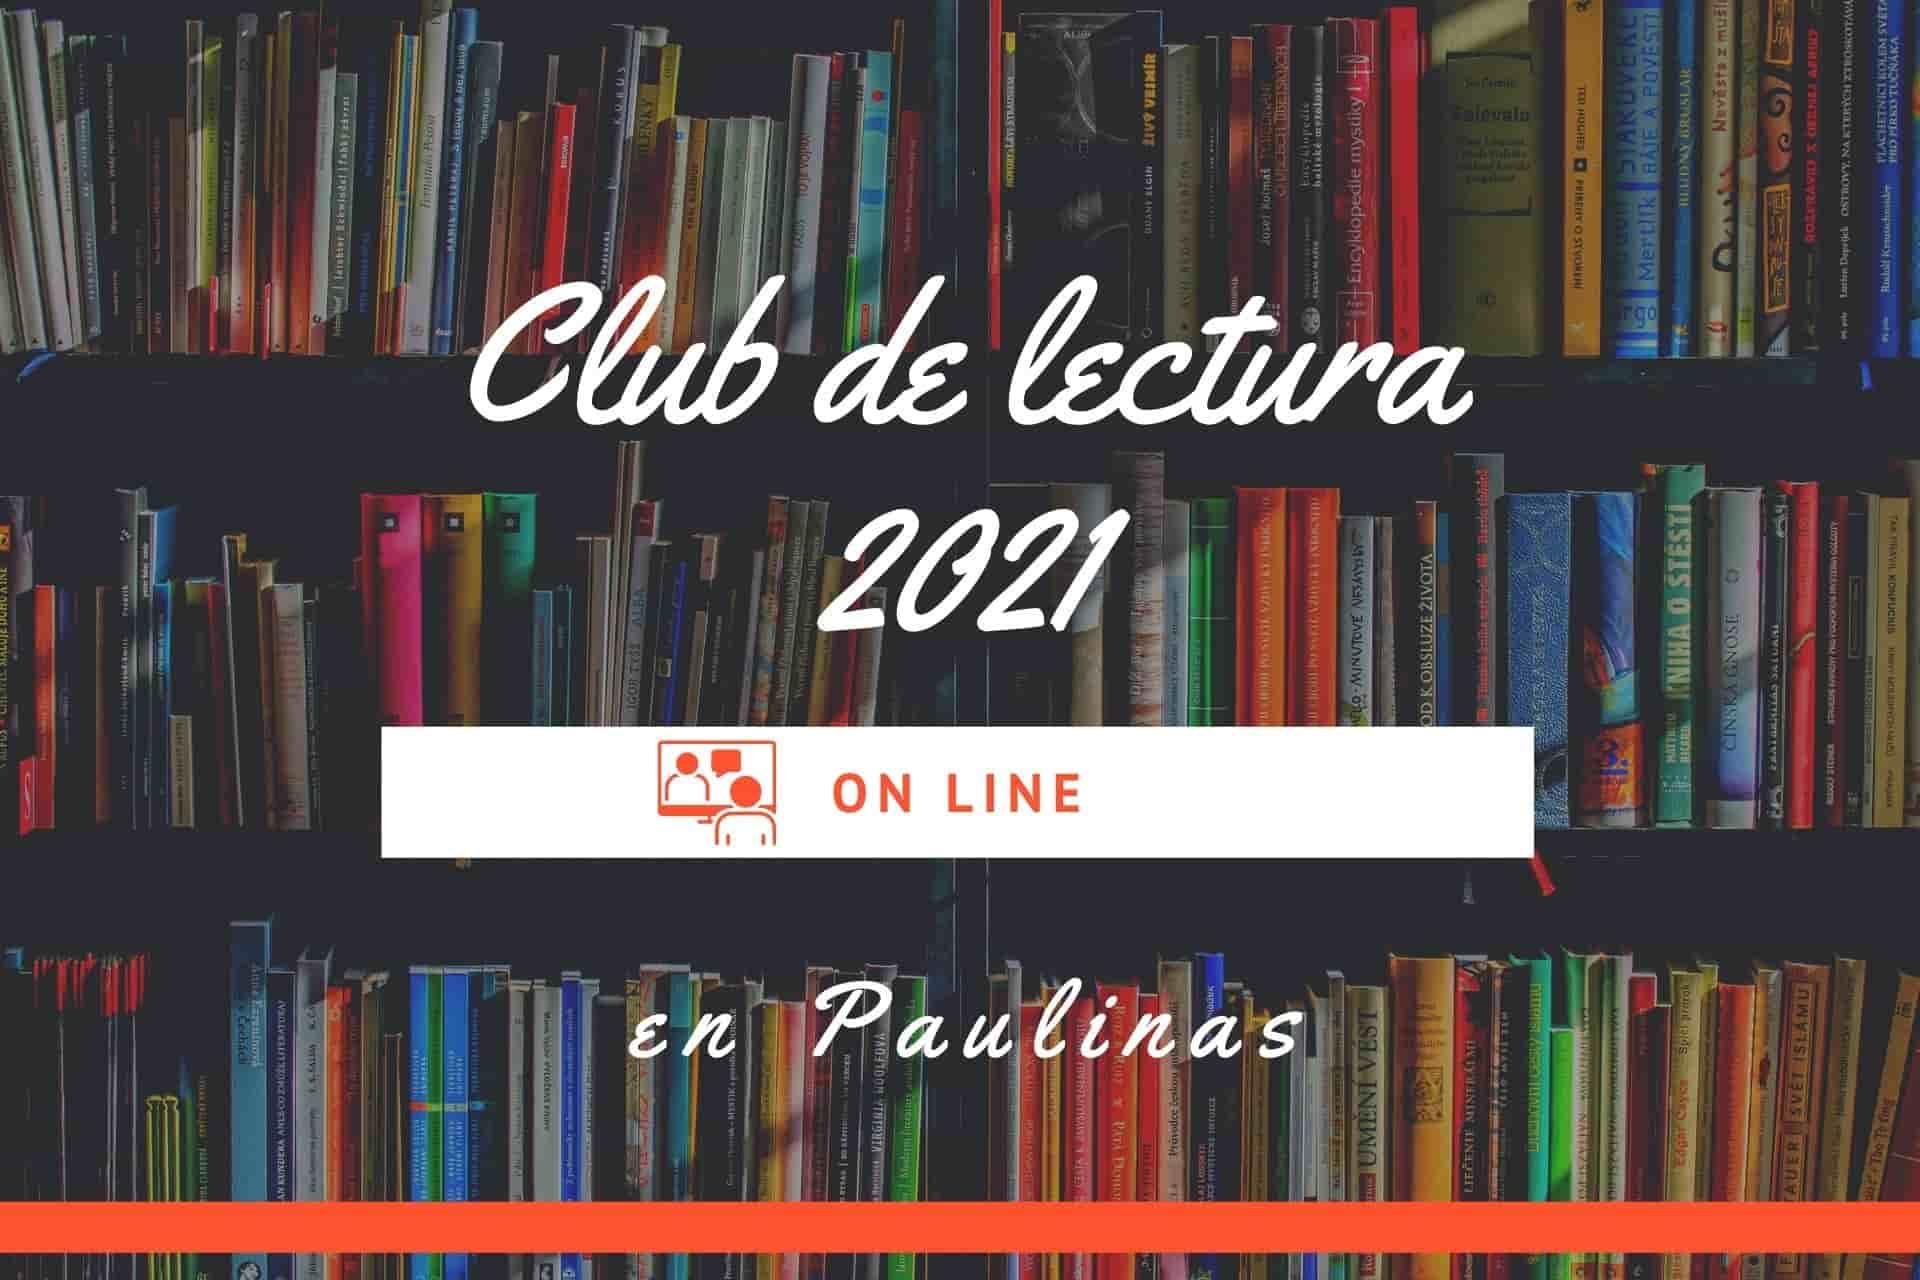 Club de lectura 2021